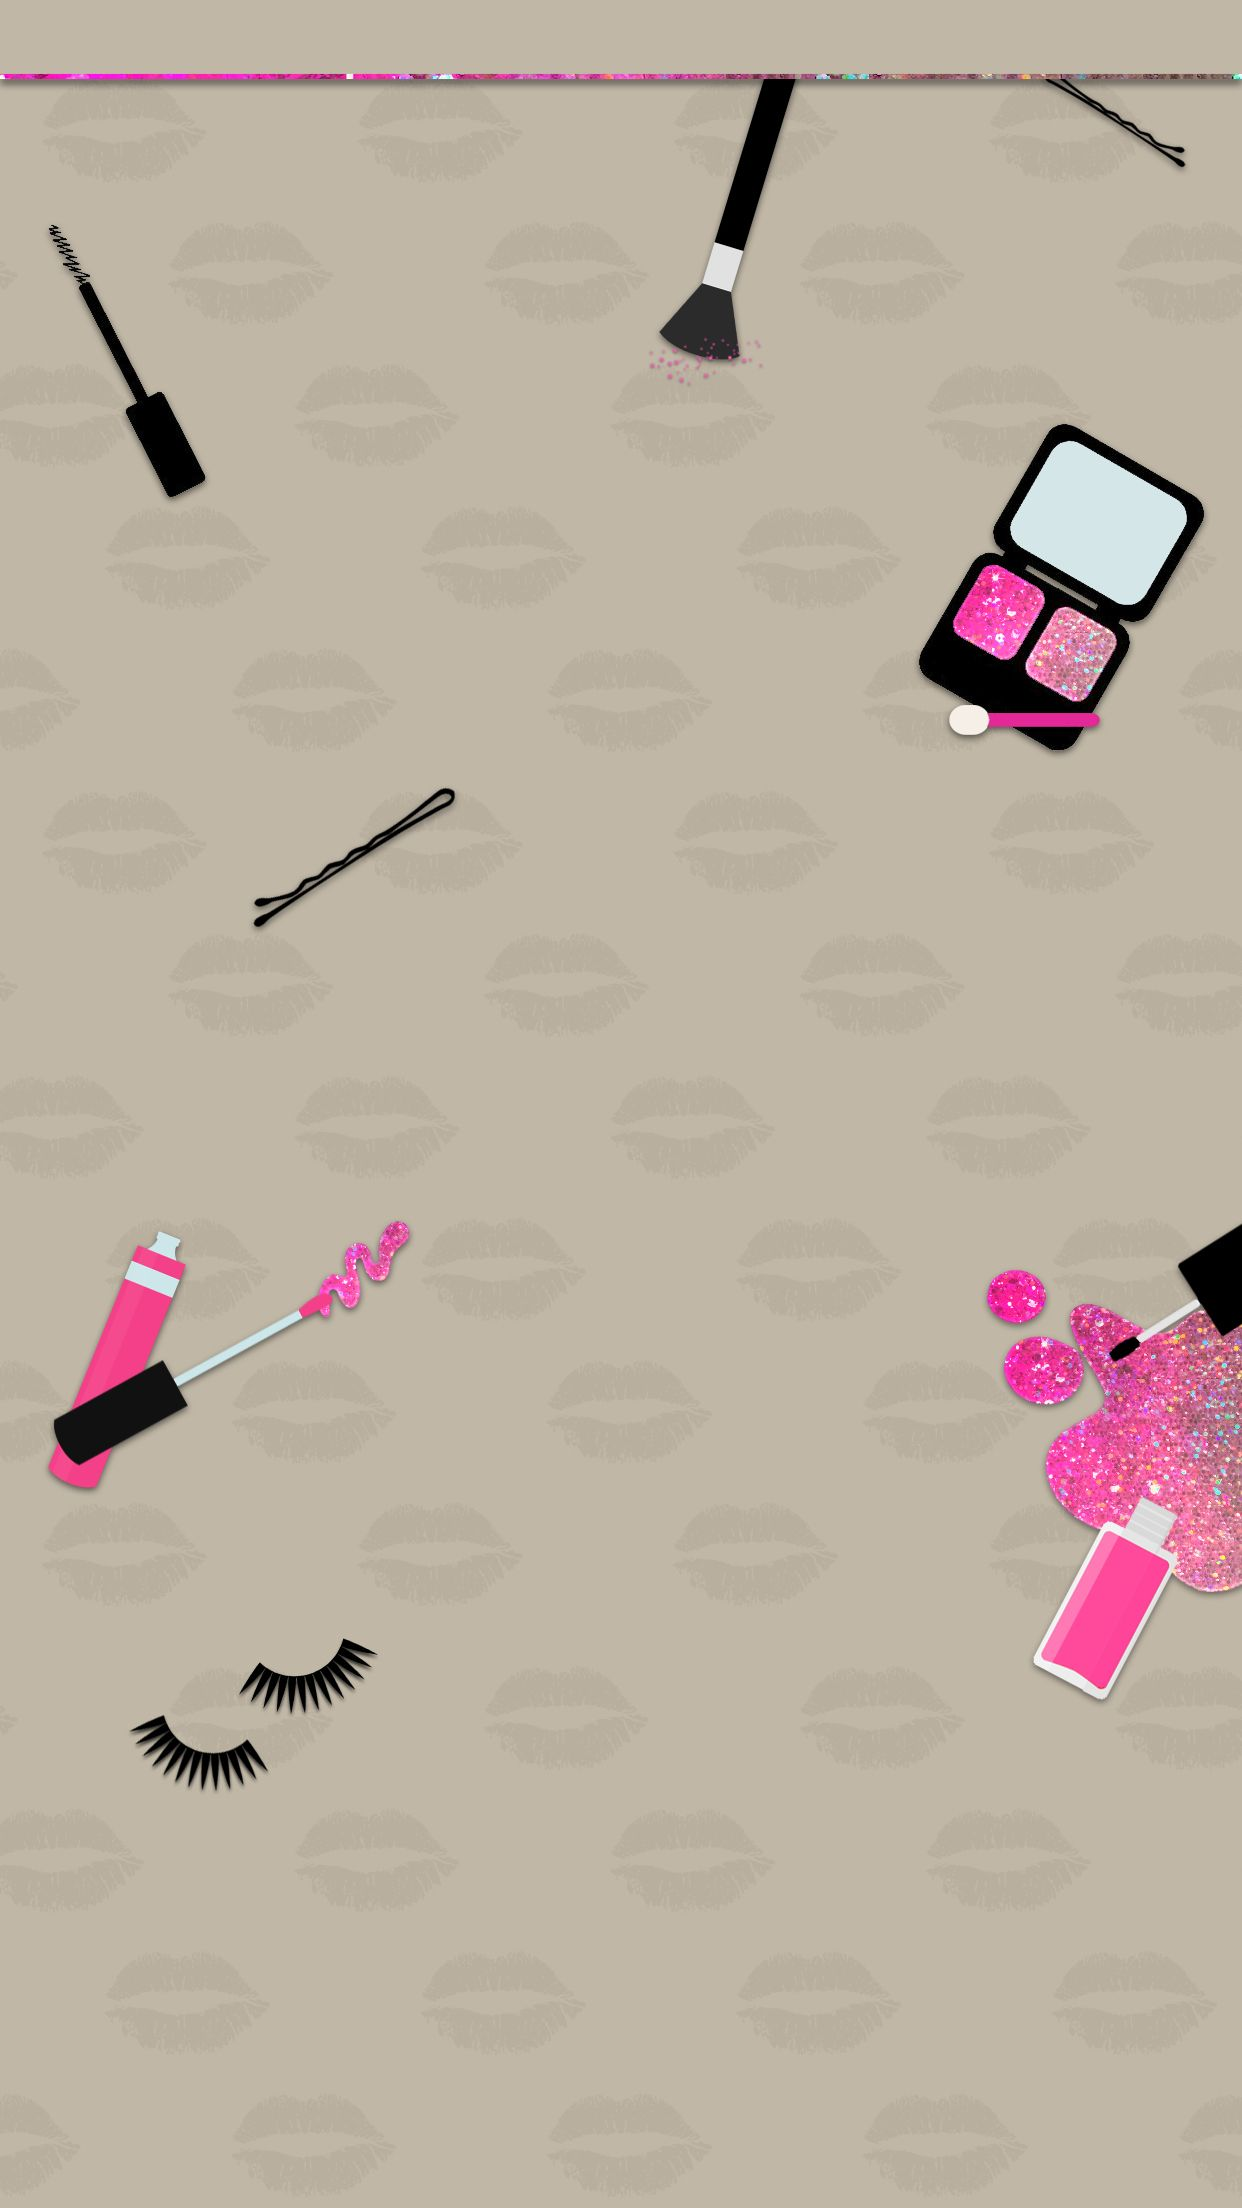 fondos de pantalla de maquillaje